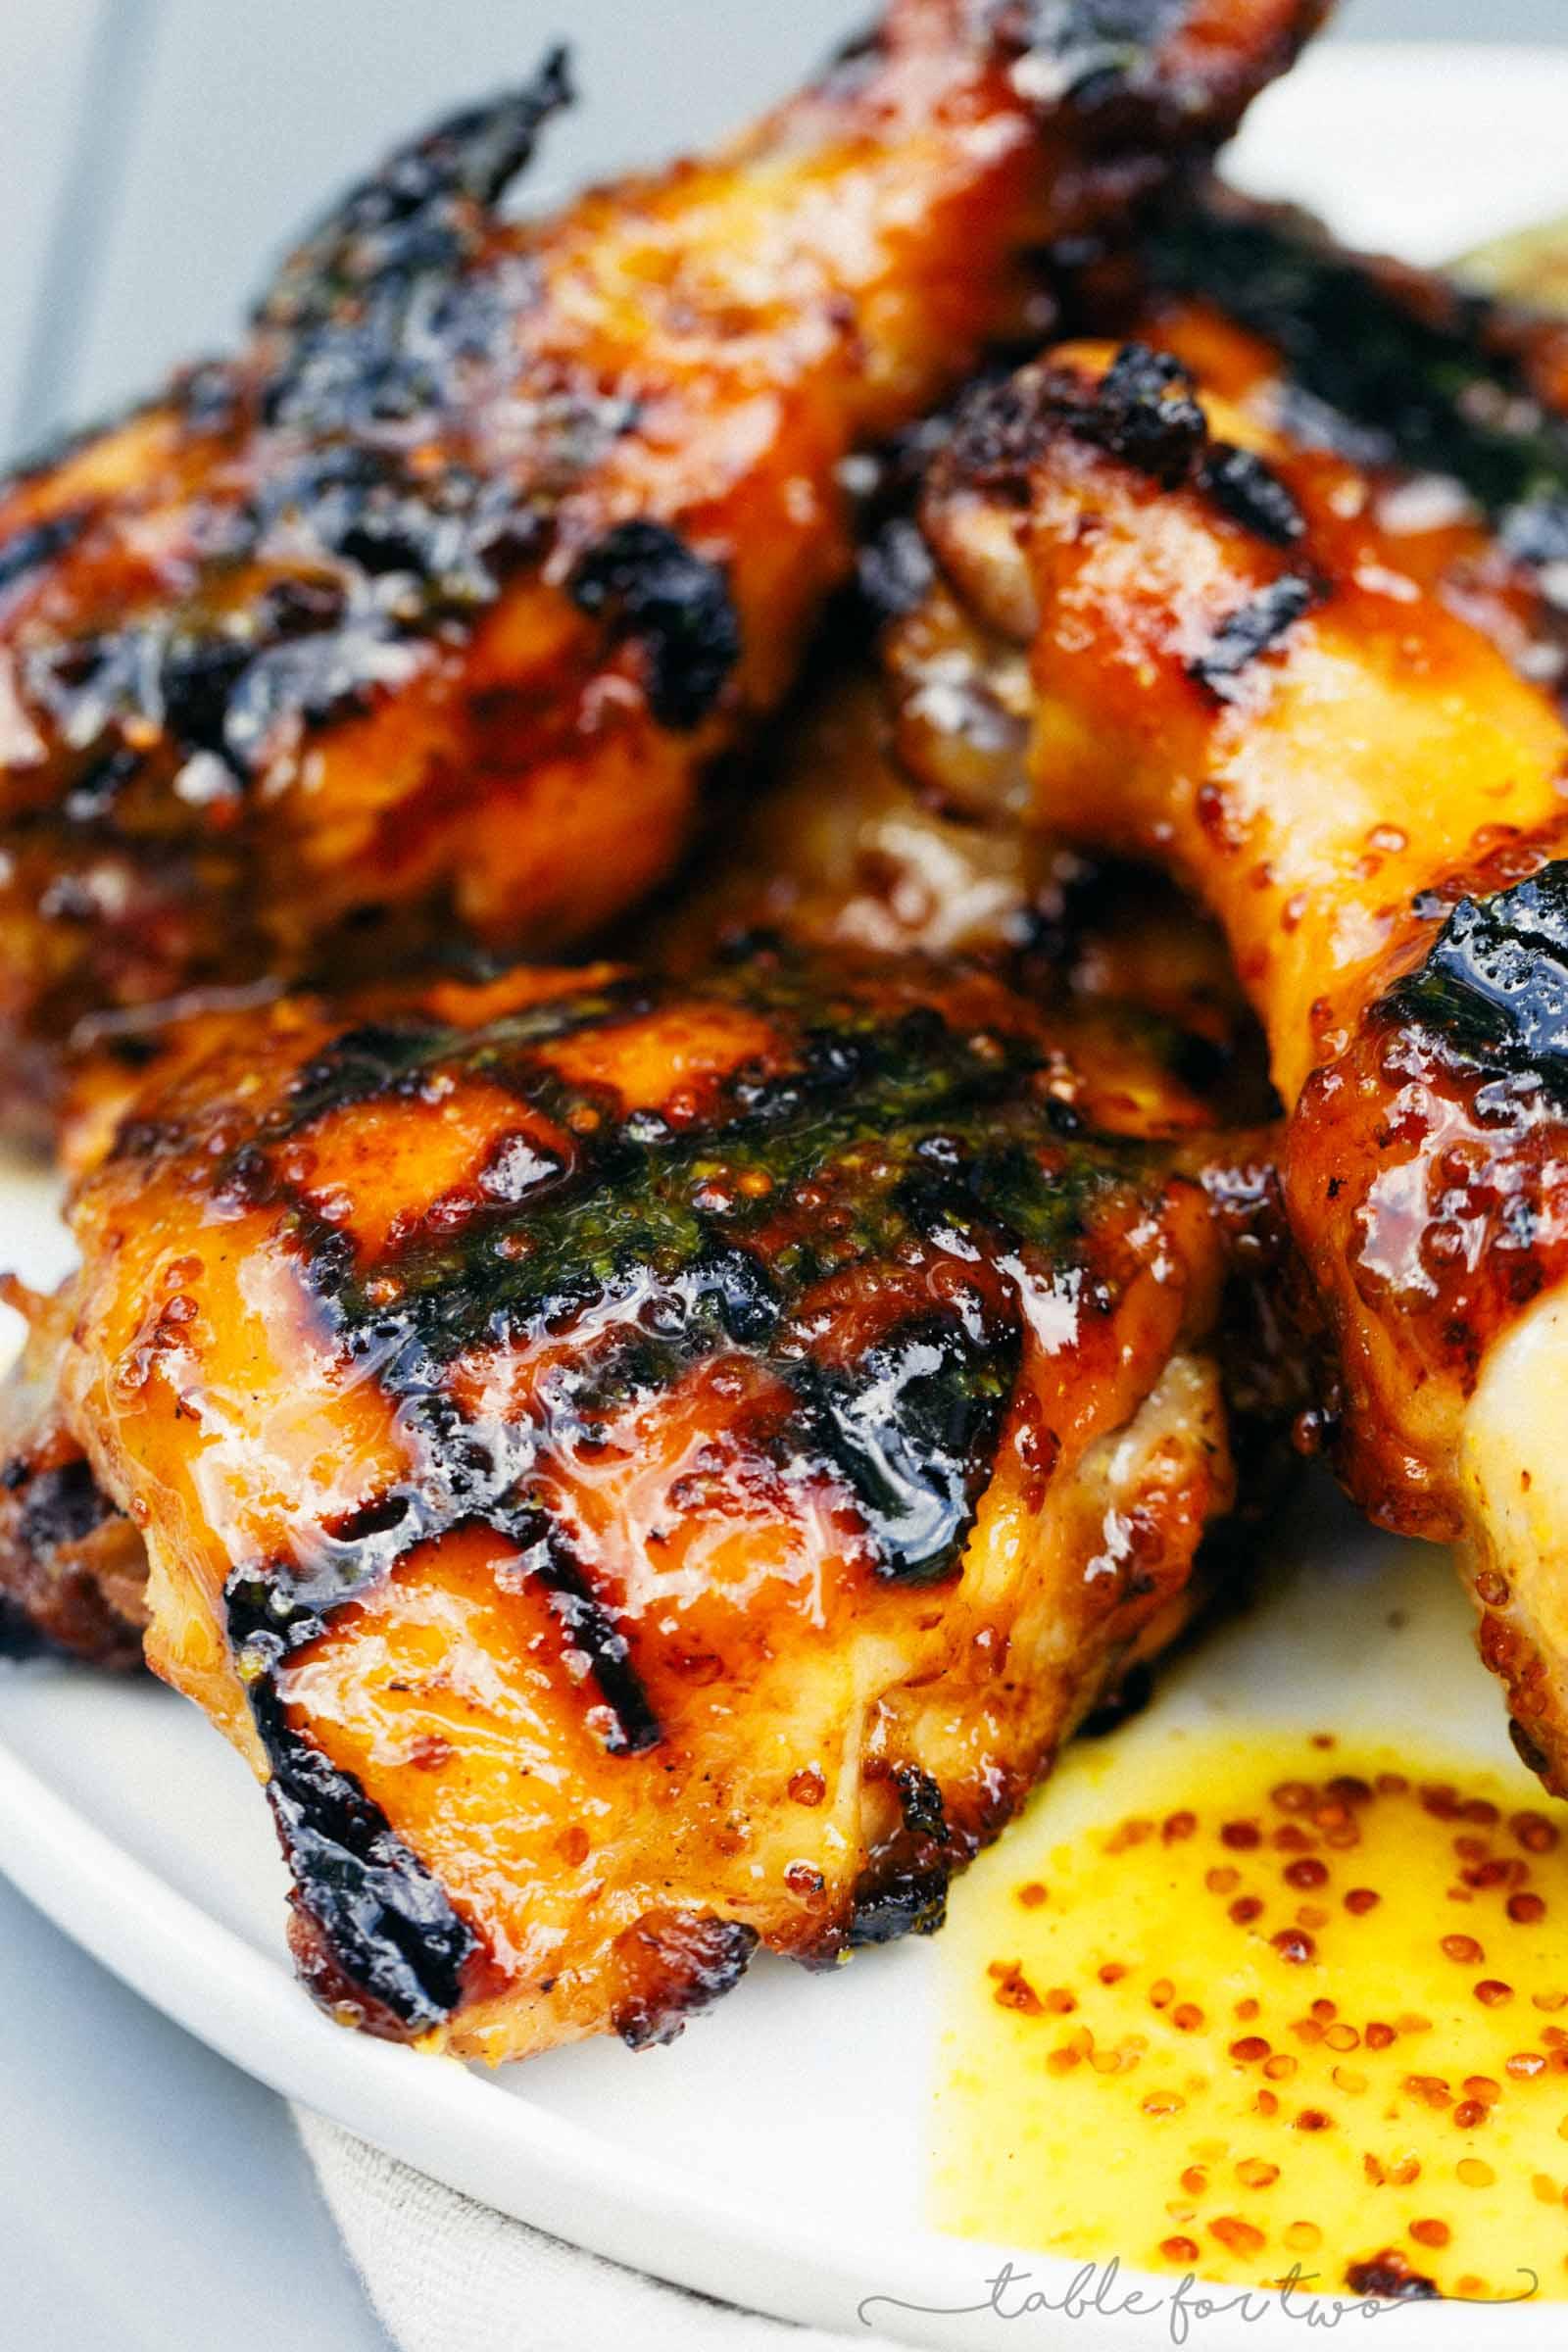 honey-mustard-chicken-and-green-beans-recipe-photos-tablefortwoblog-4.jpg